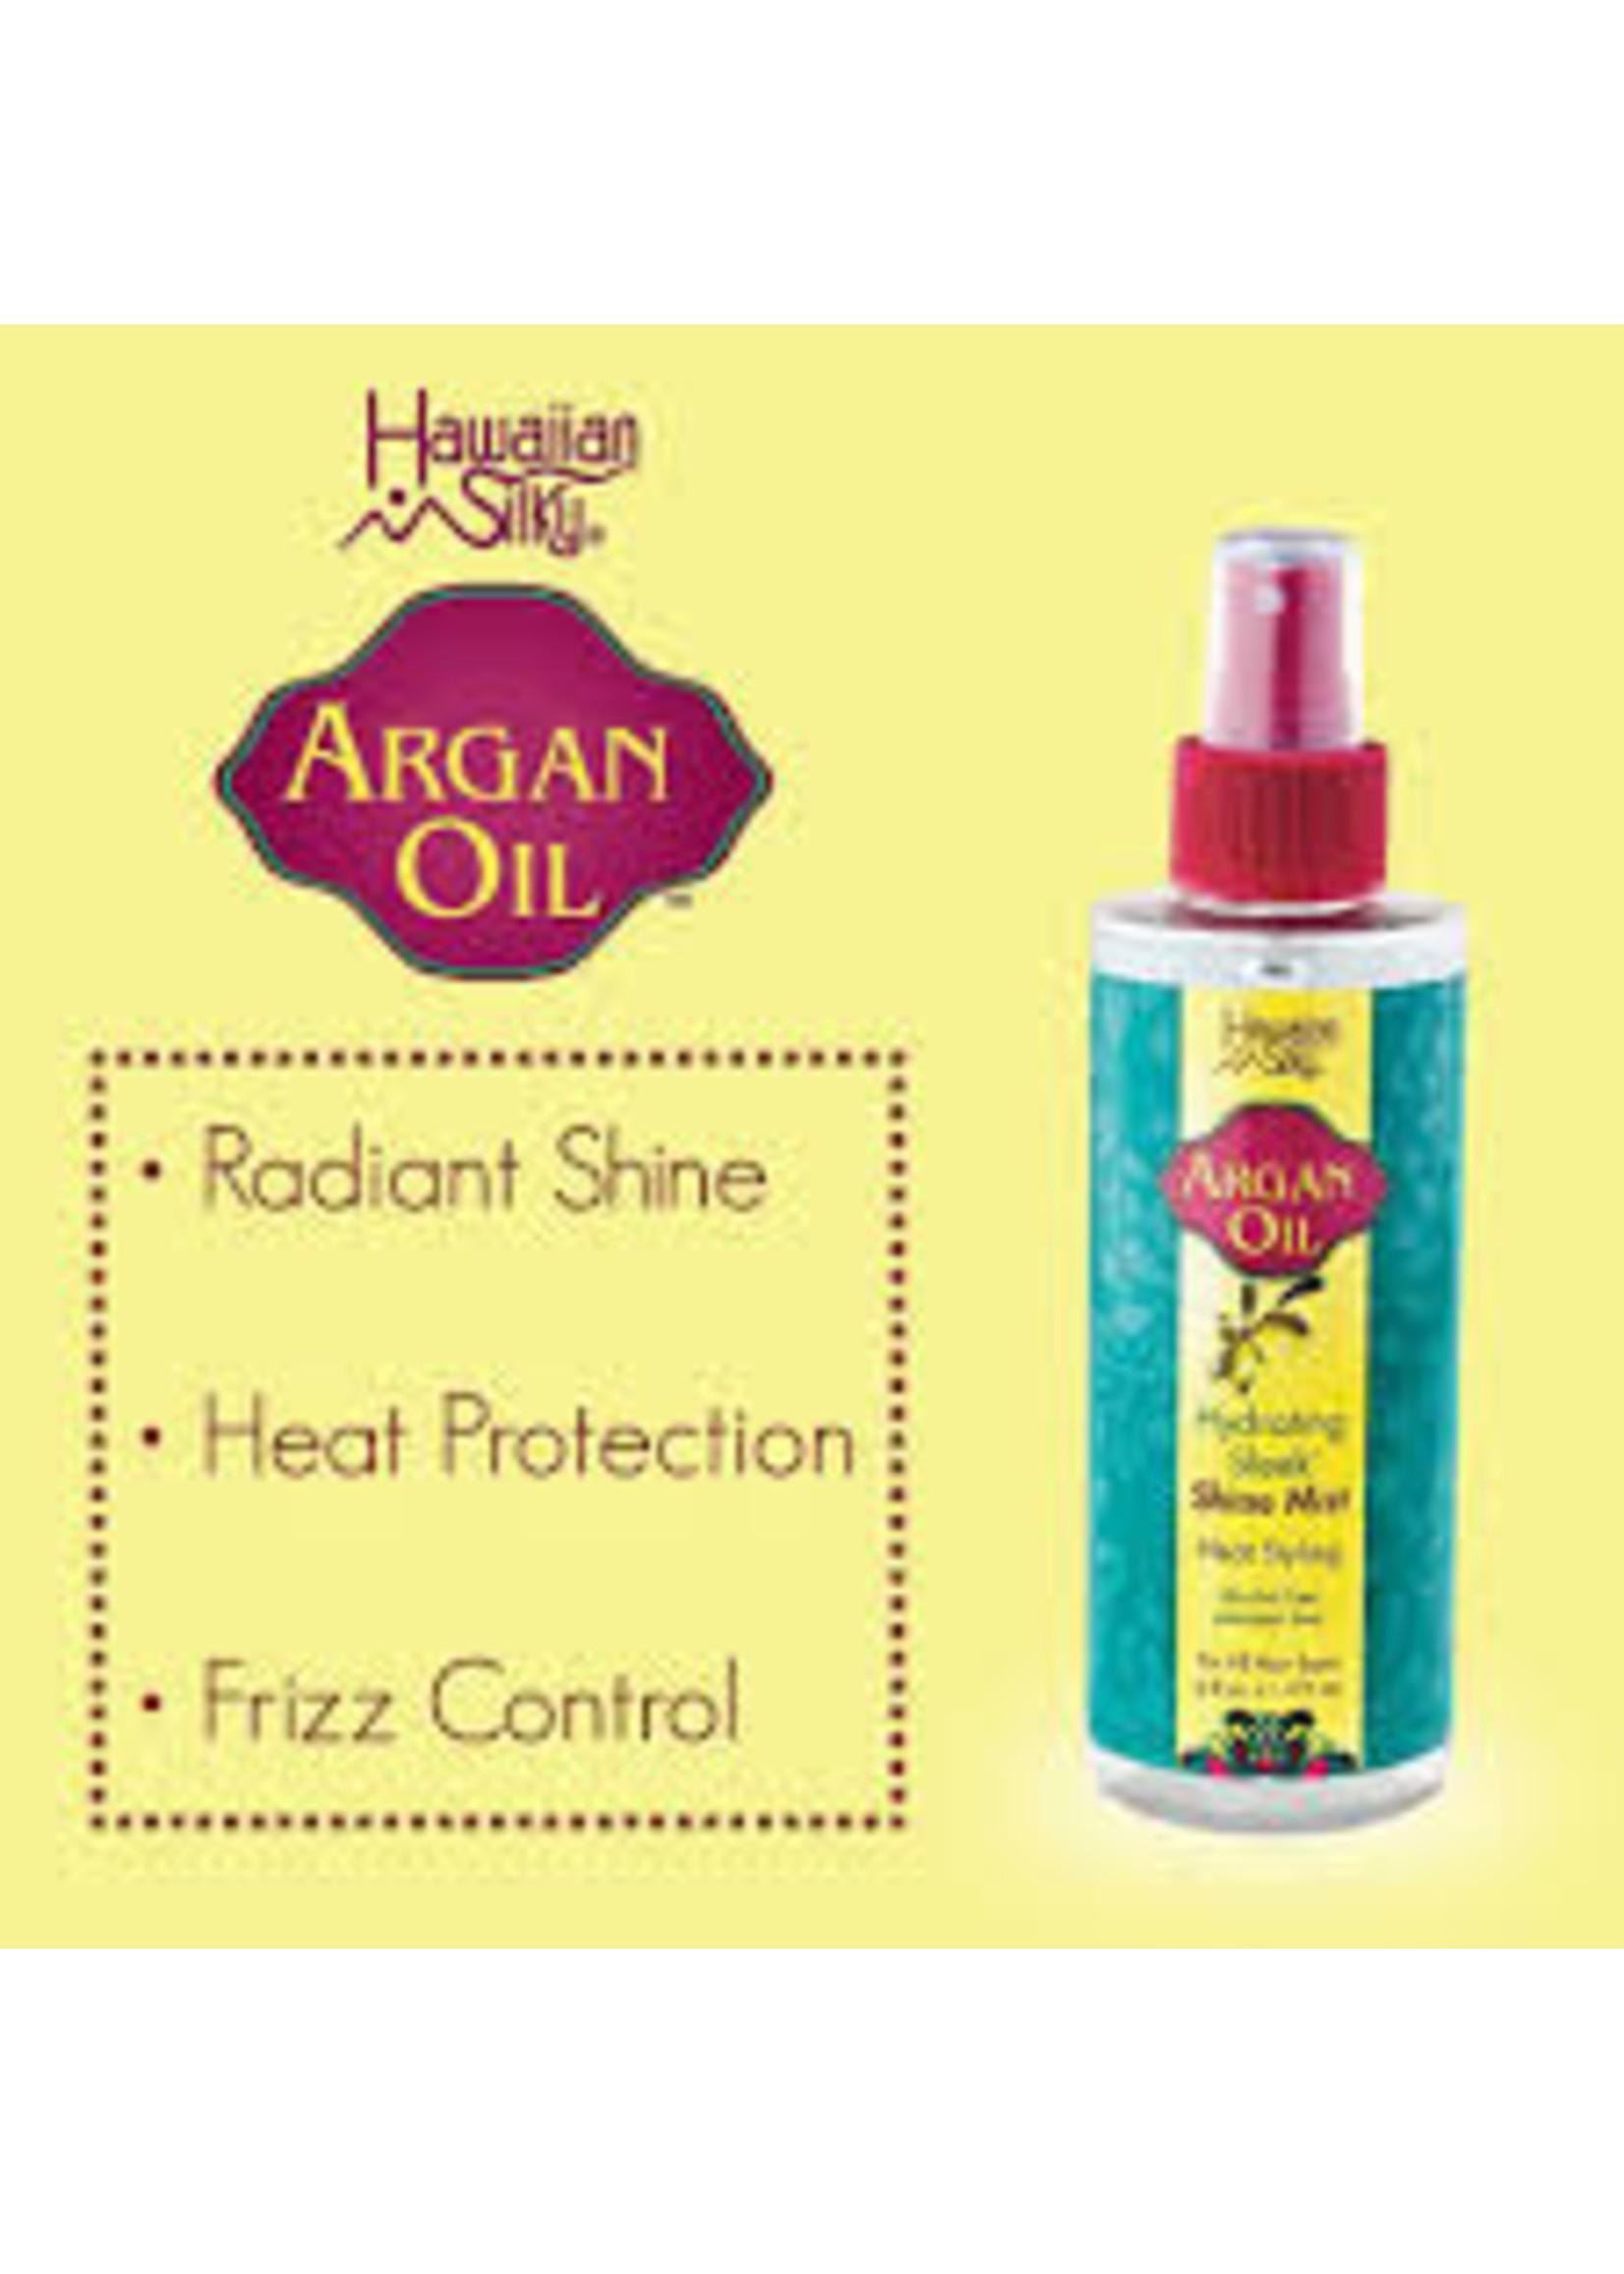 Hawaiian Silky Argan Oil Hydrating Sleek Shine Mist